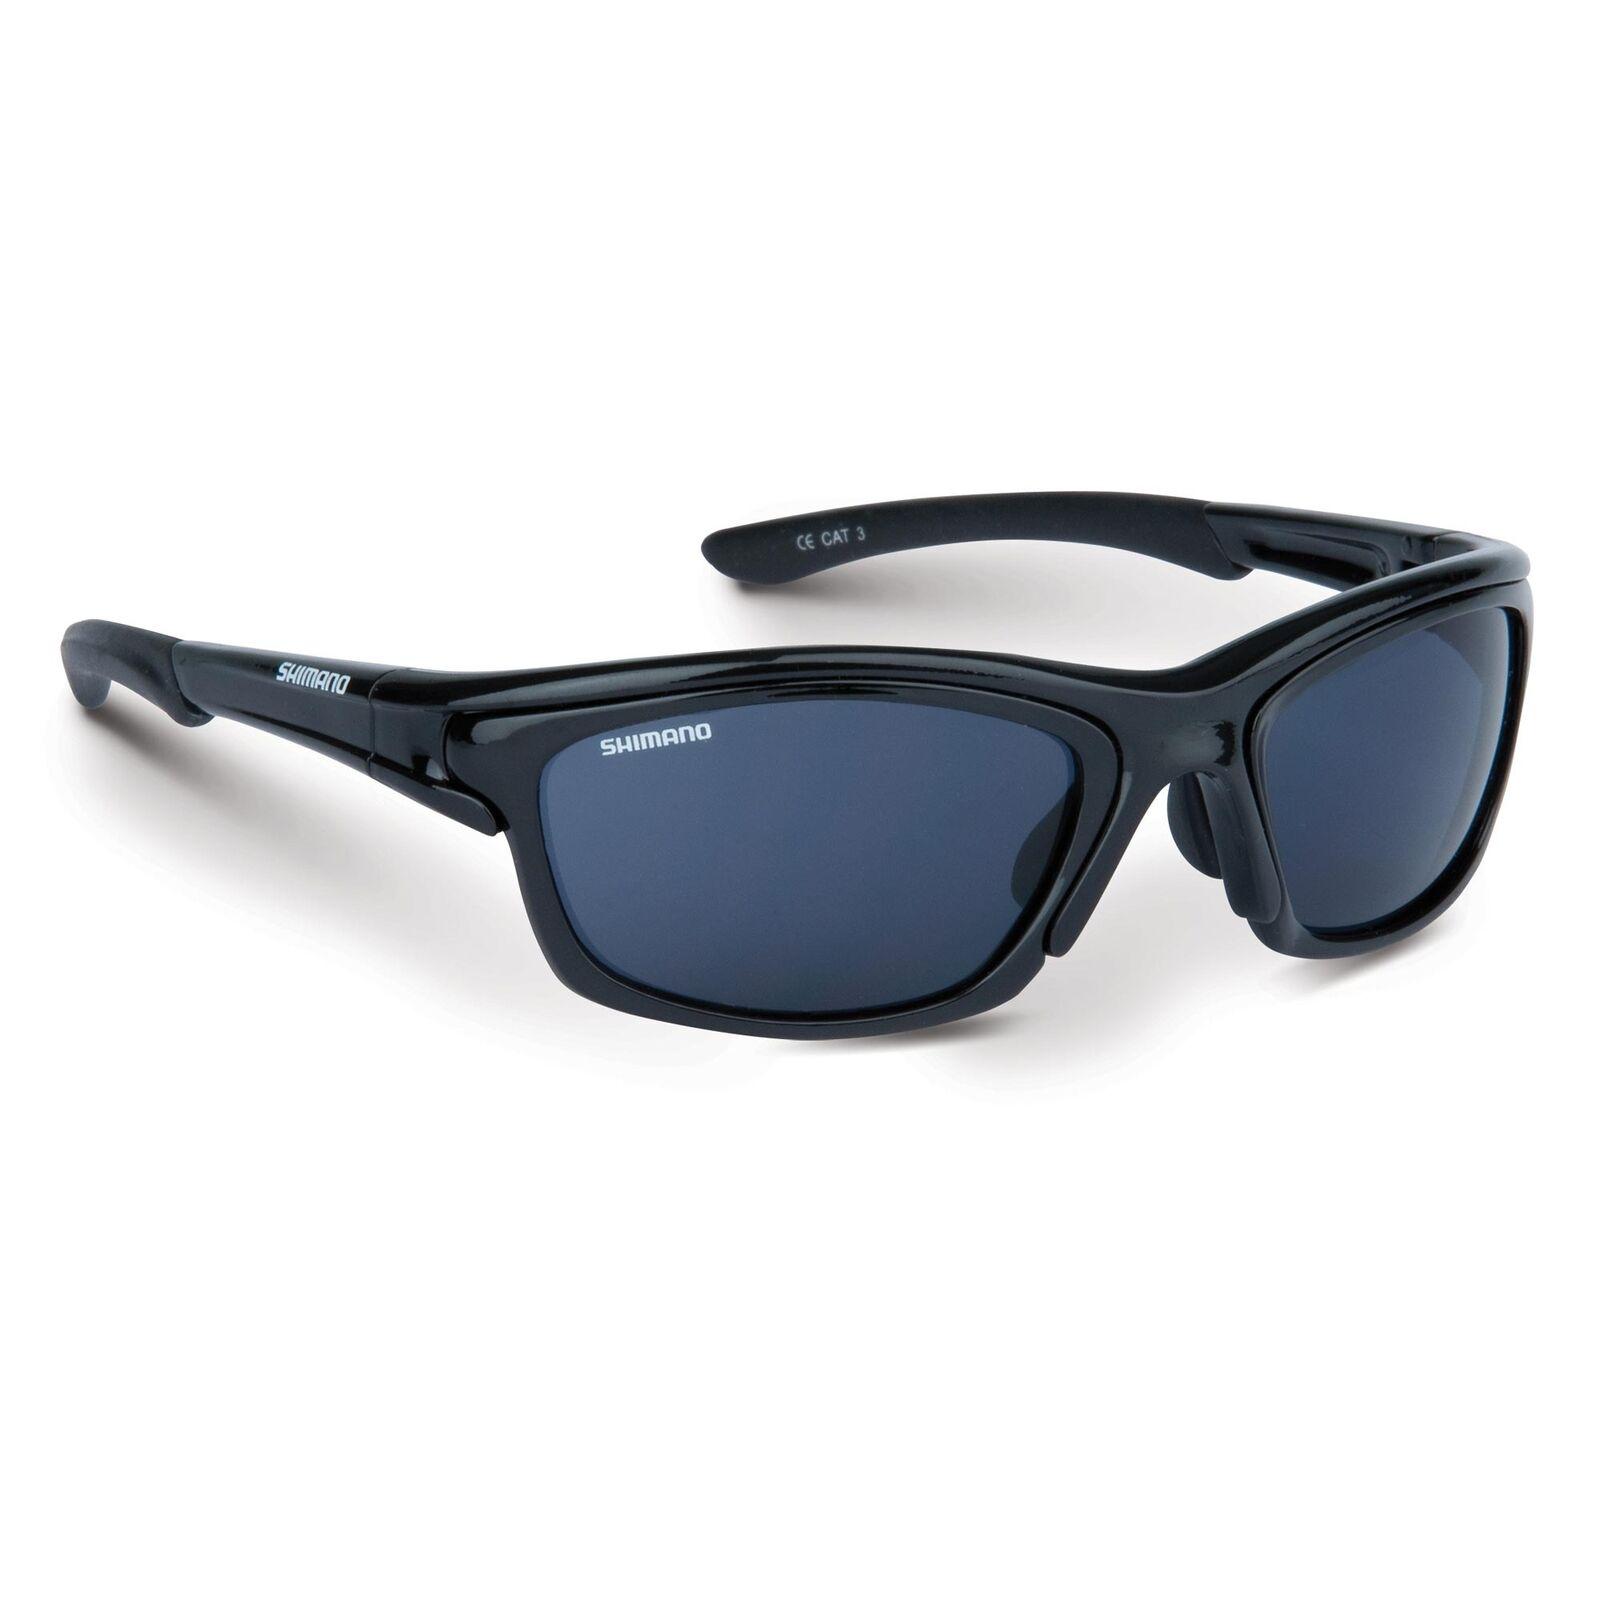 Shihommeo Polarization Glasses Sunglass-Aero wechselglass-gris jaune-polbrille